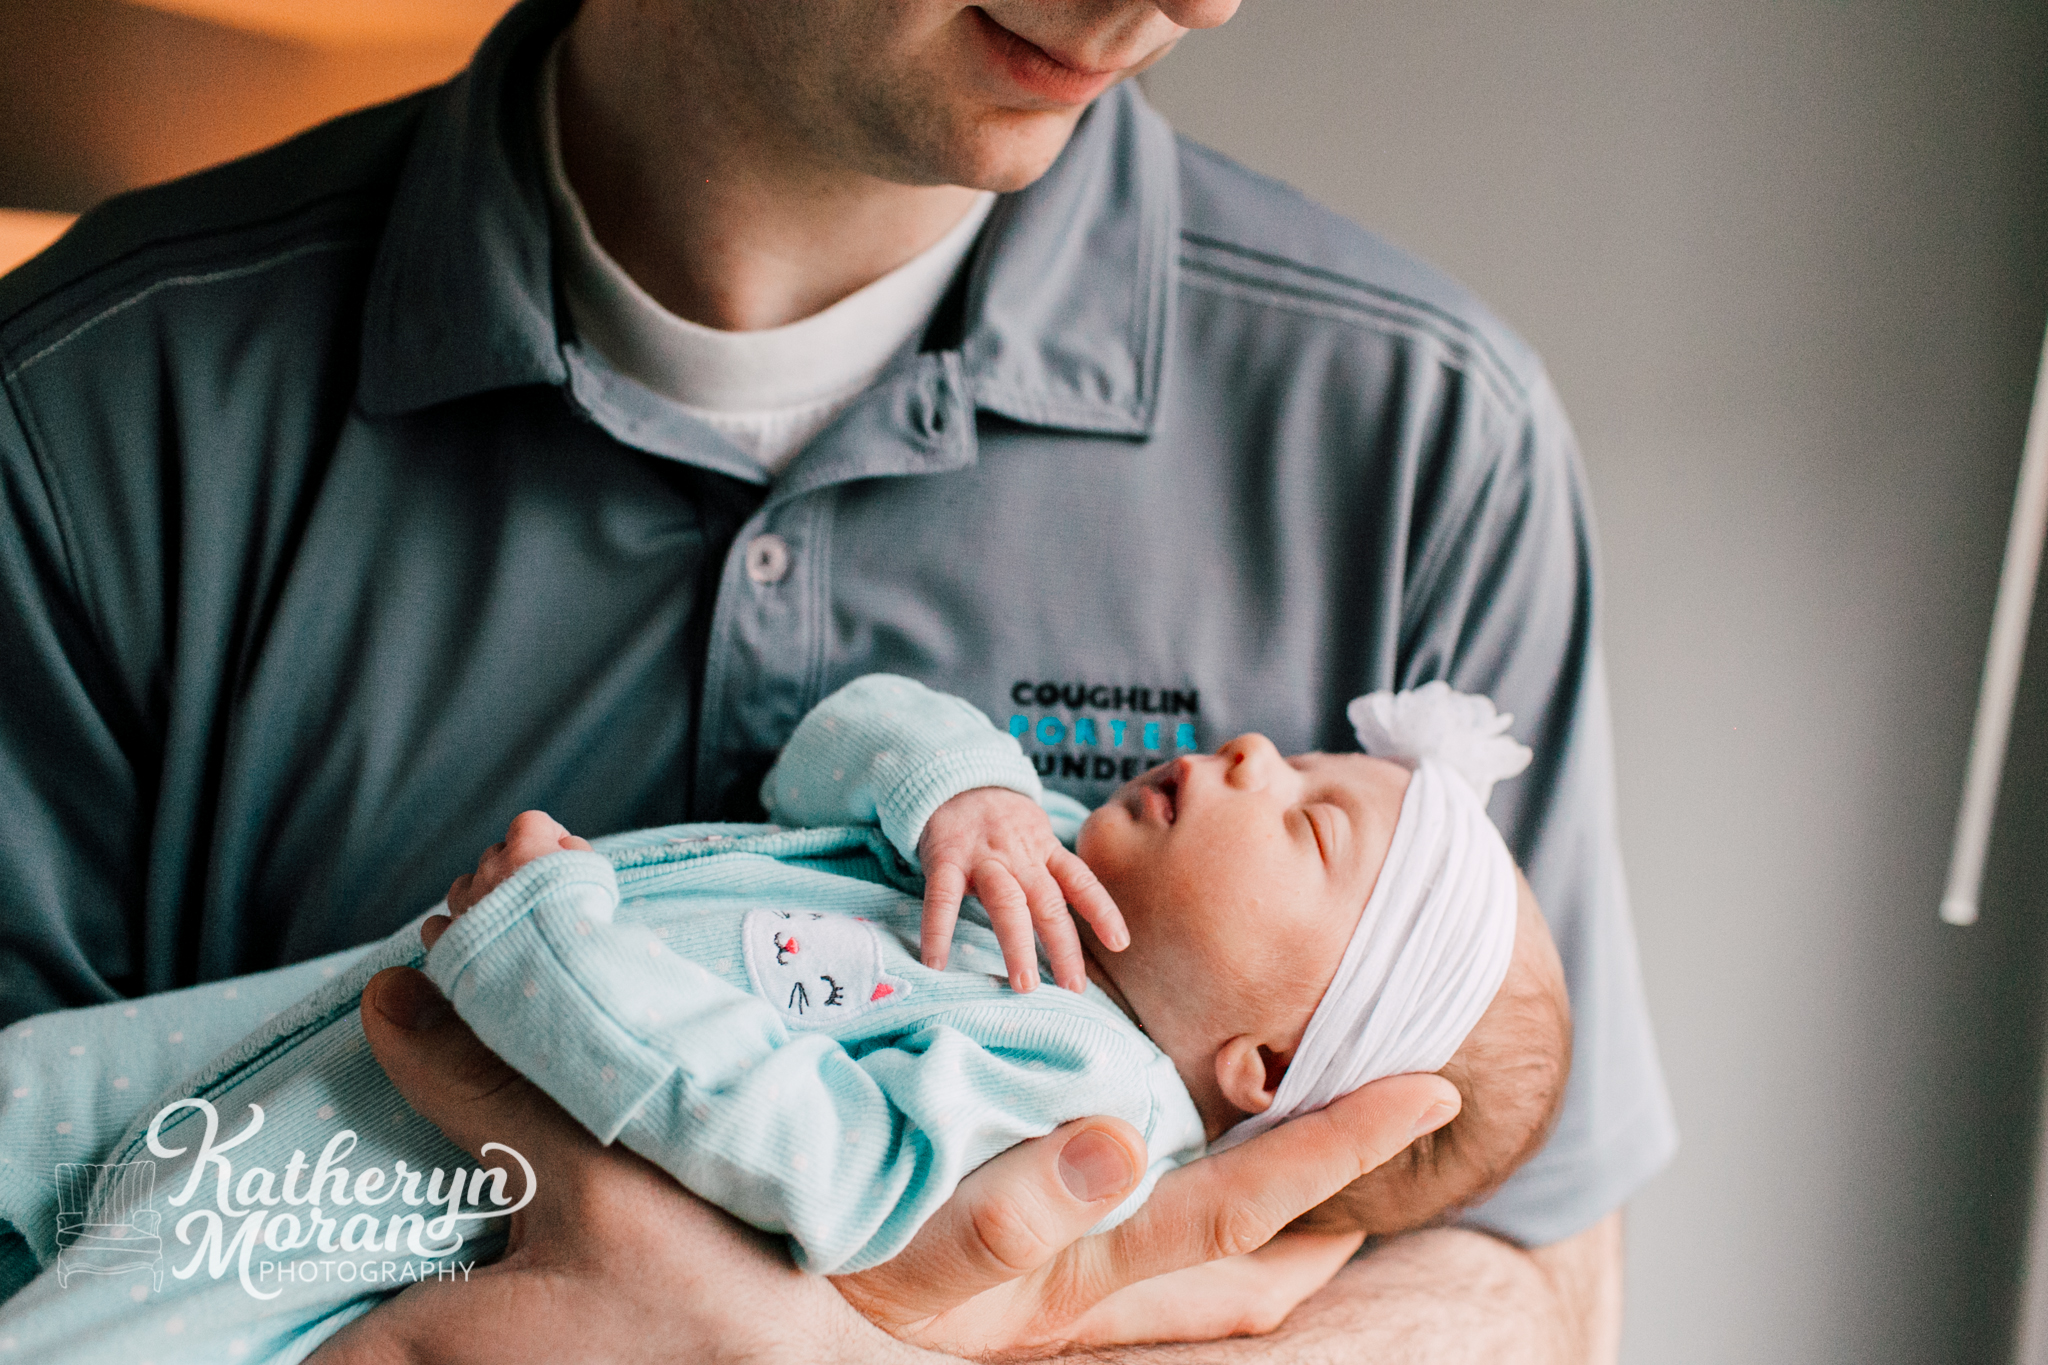 seattle-newborn-photographer-katheryn-moran-avery-malaspino-27.jpg